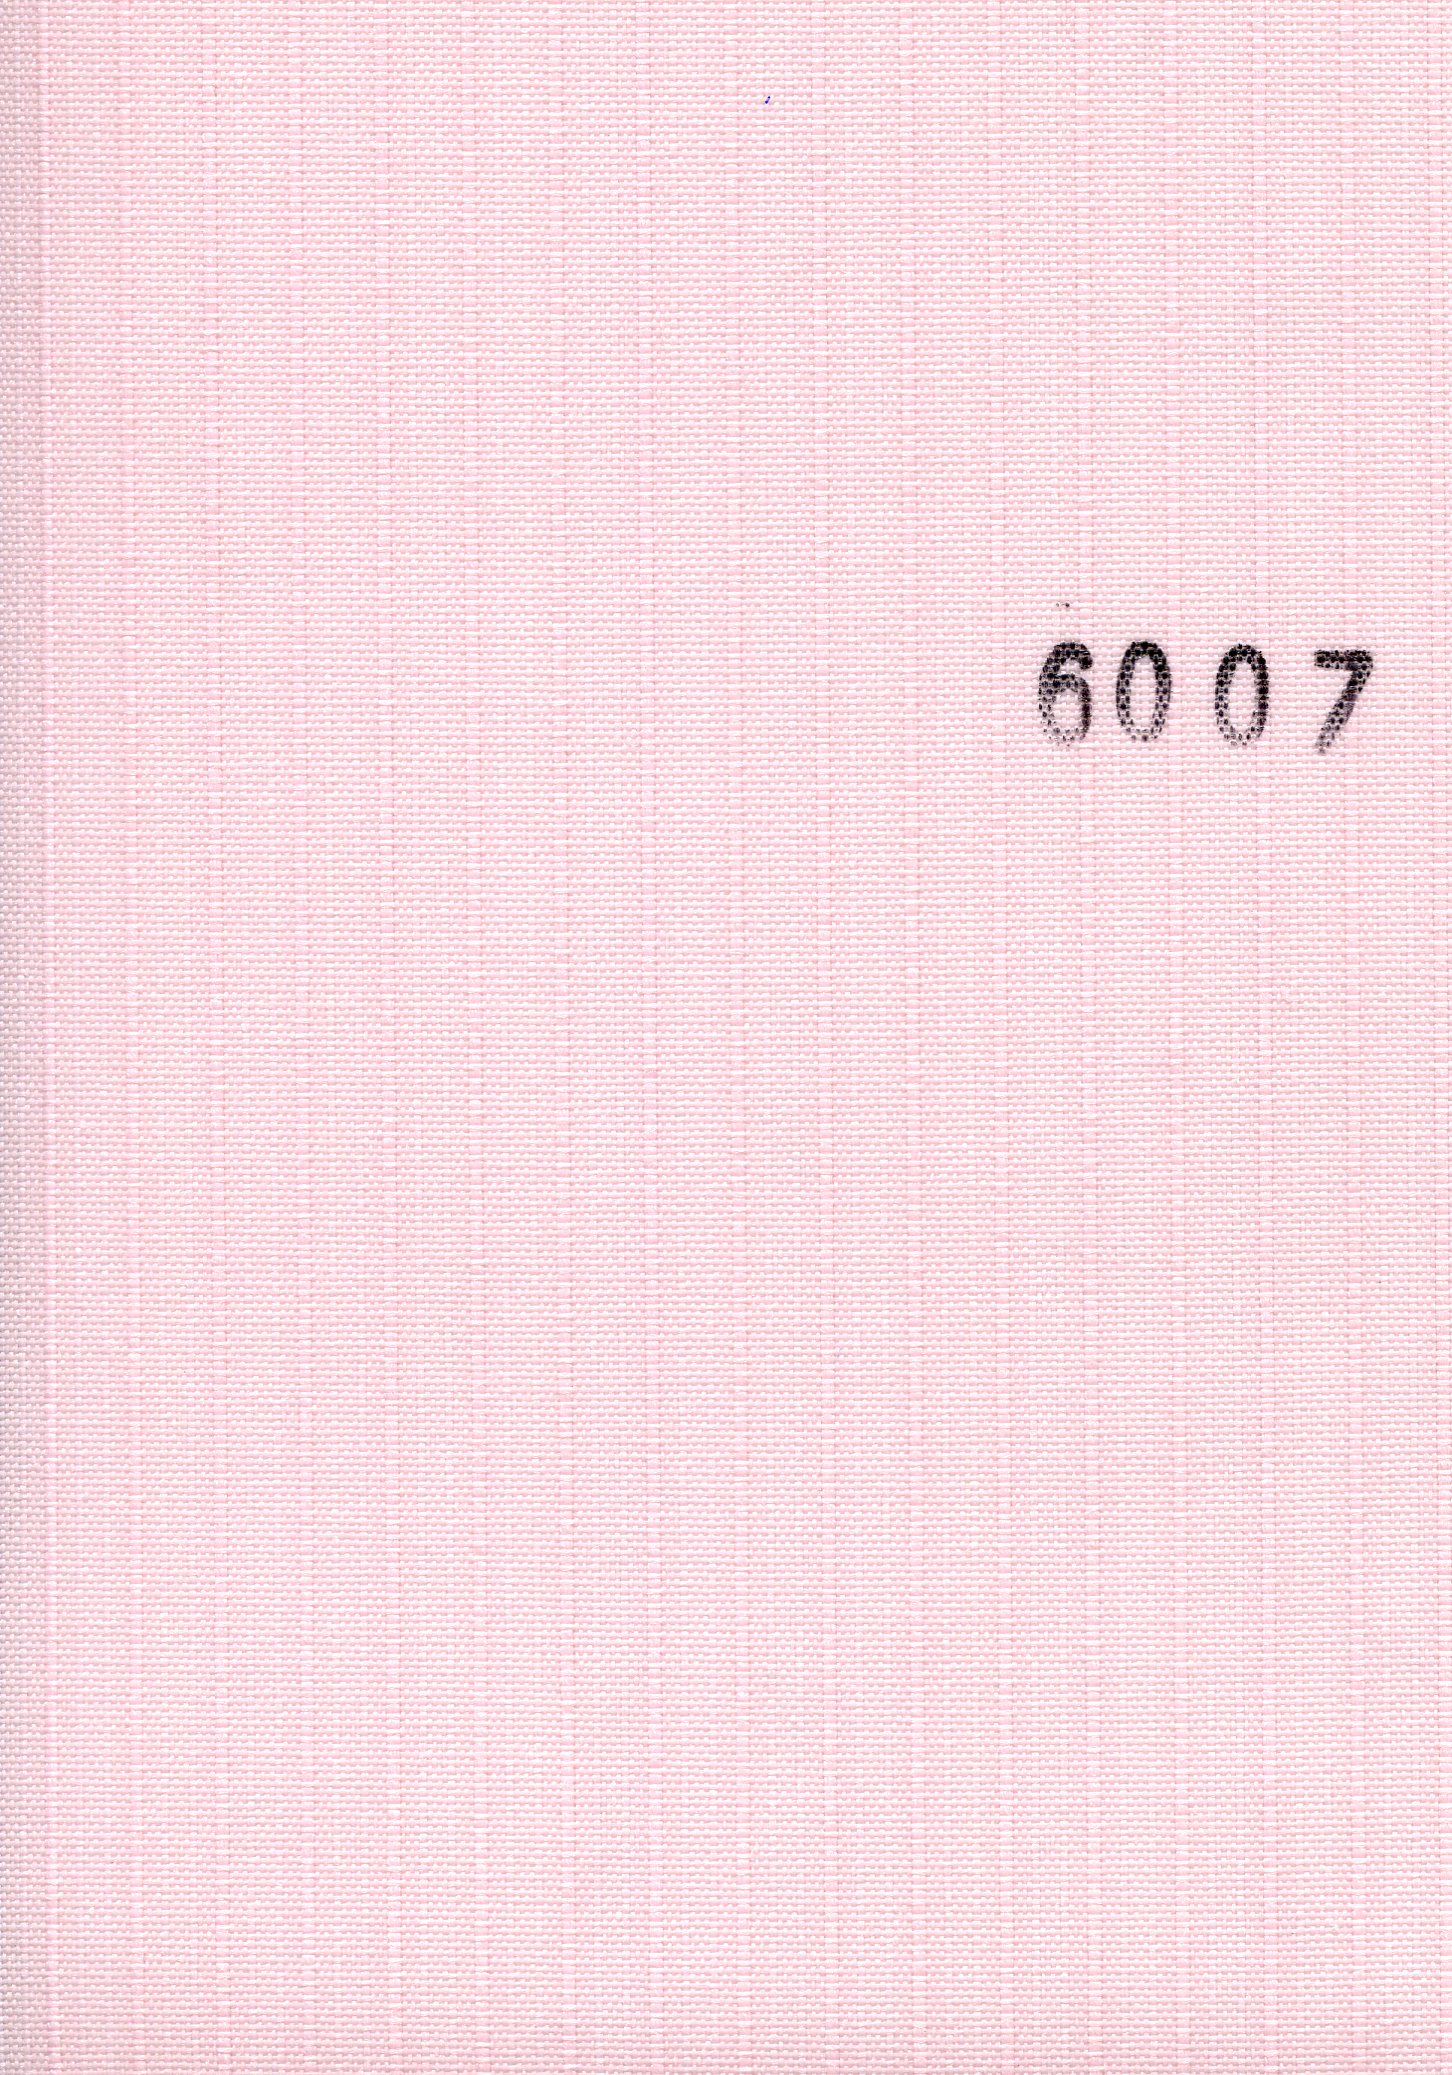 Line 6007